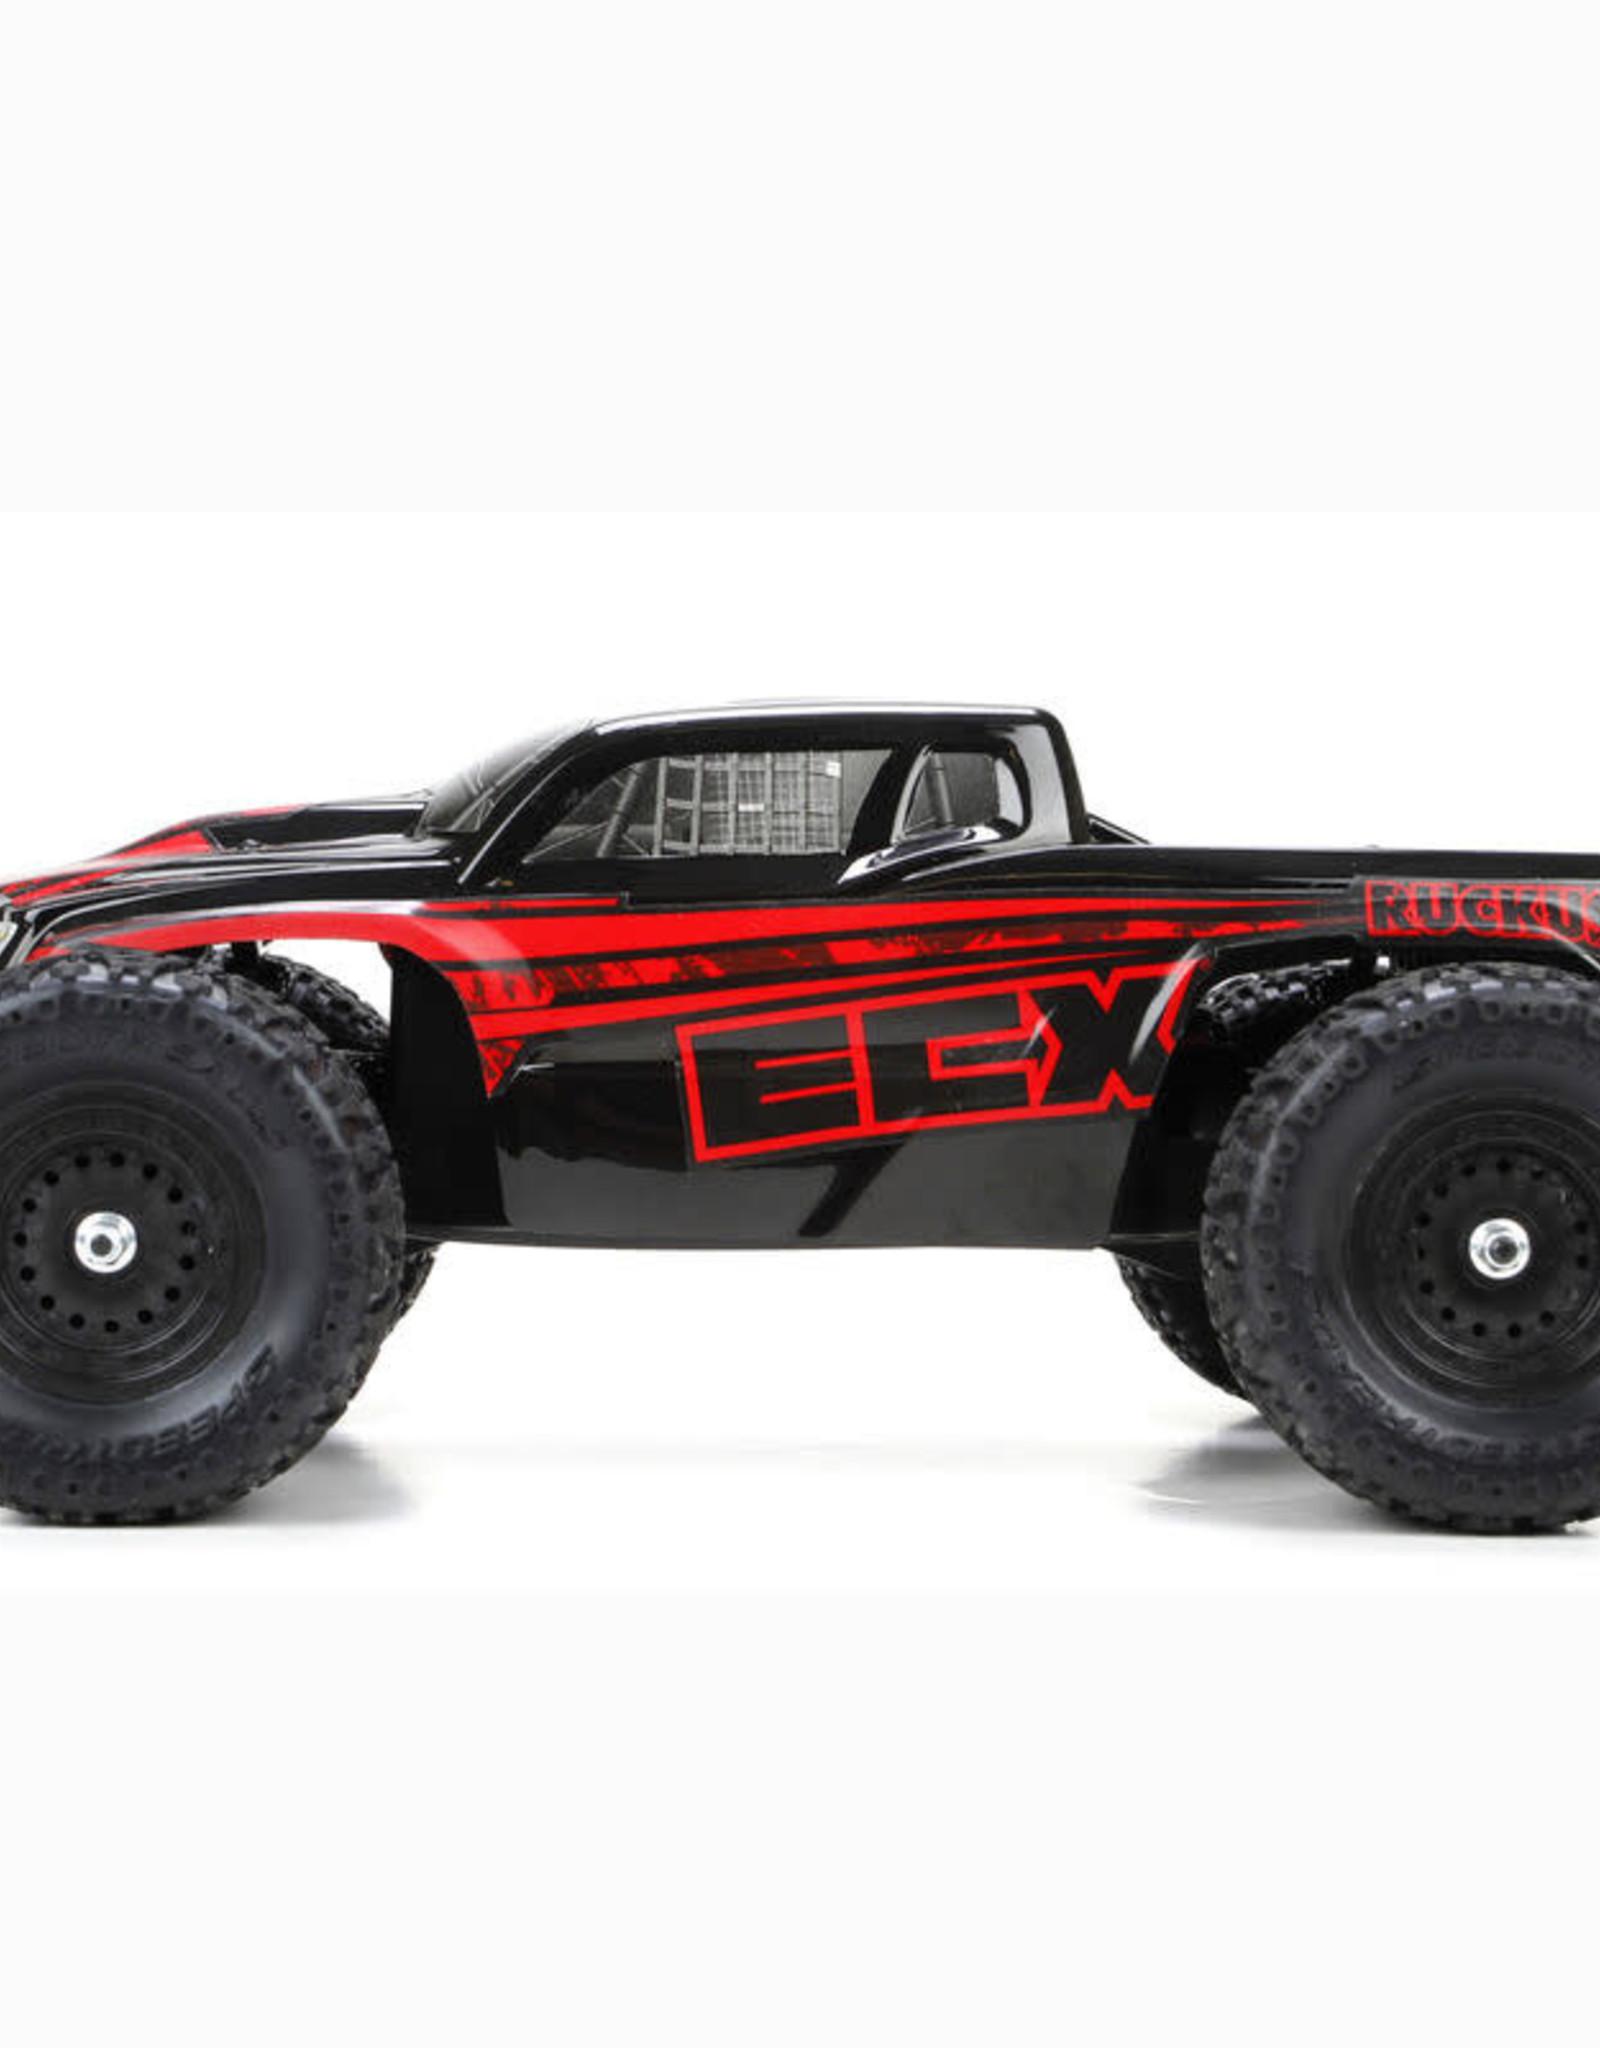 ECX ECX010000T1 Ruckus 1/18 4WD Monster Truck Black/Red RTR